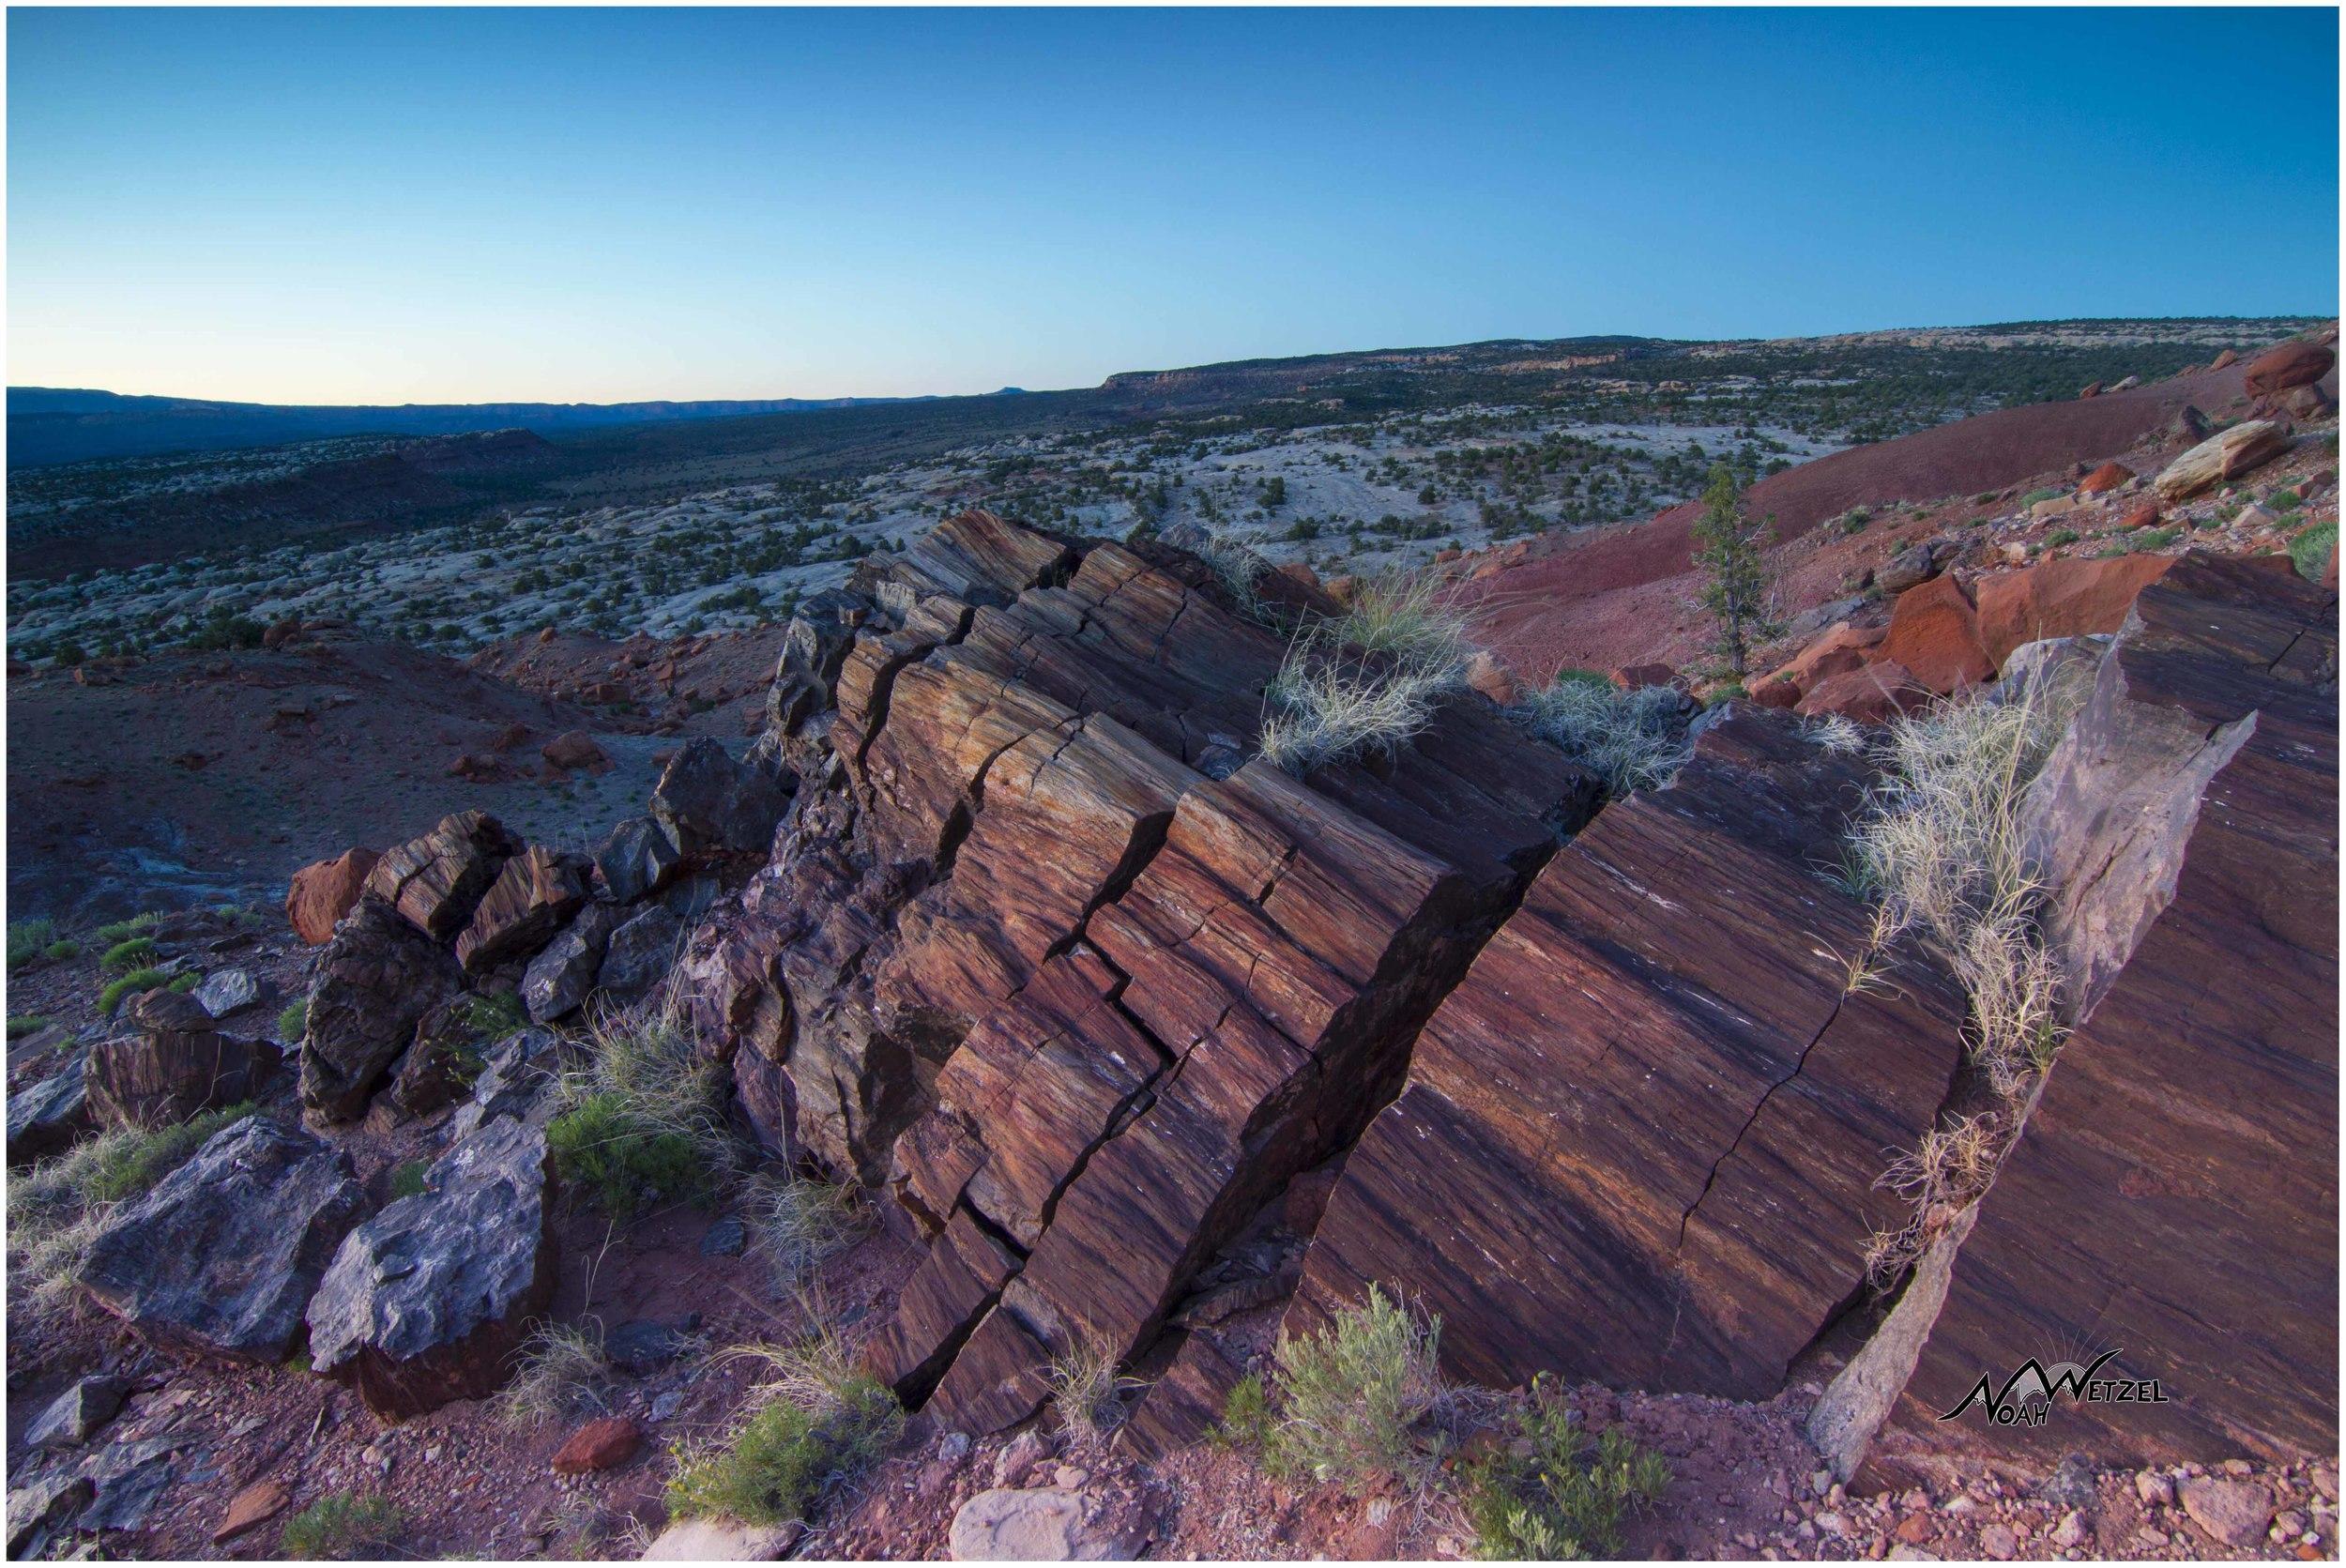 Section of Petrified Wood. Escalante, Utah